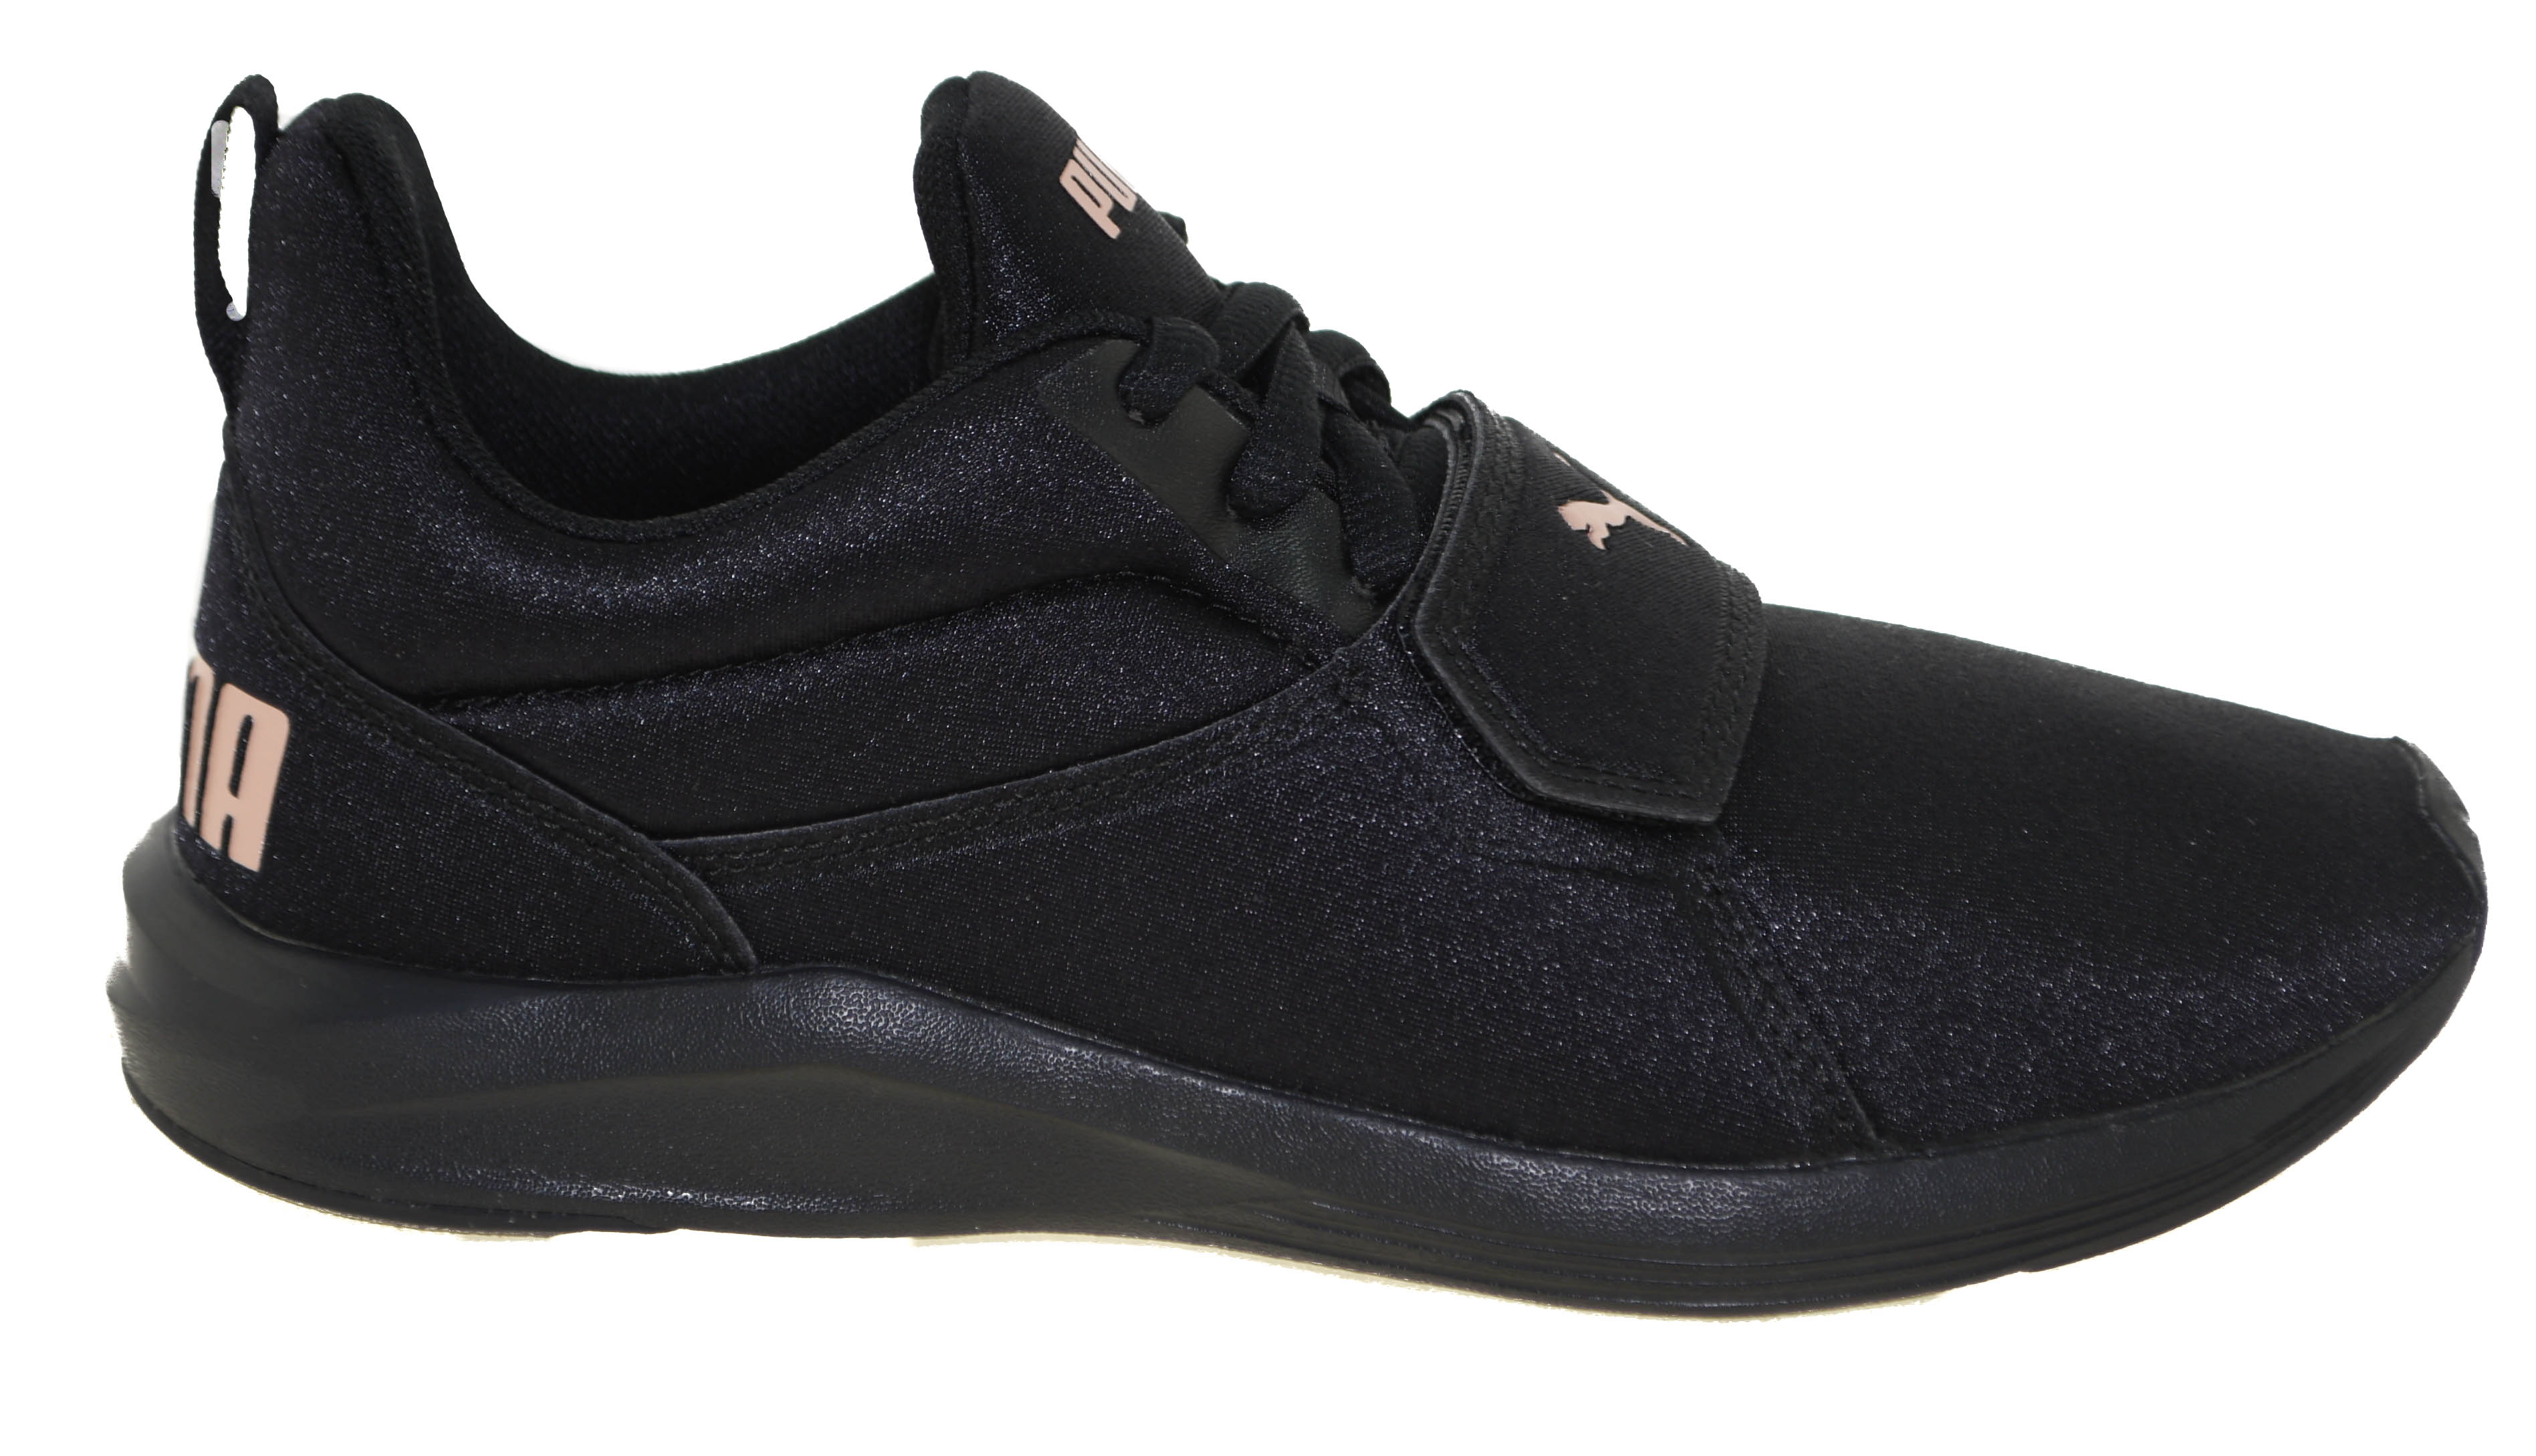 61fd5b49a5f82f Puma Women s Prodigy Running Shoes Black Gold Style 191525-01